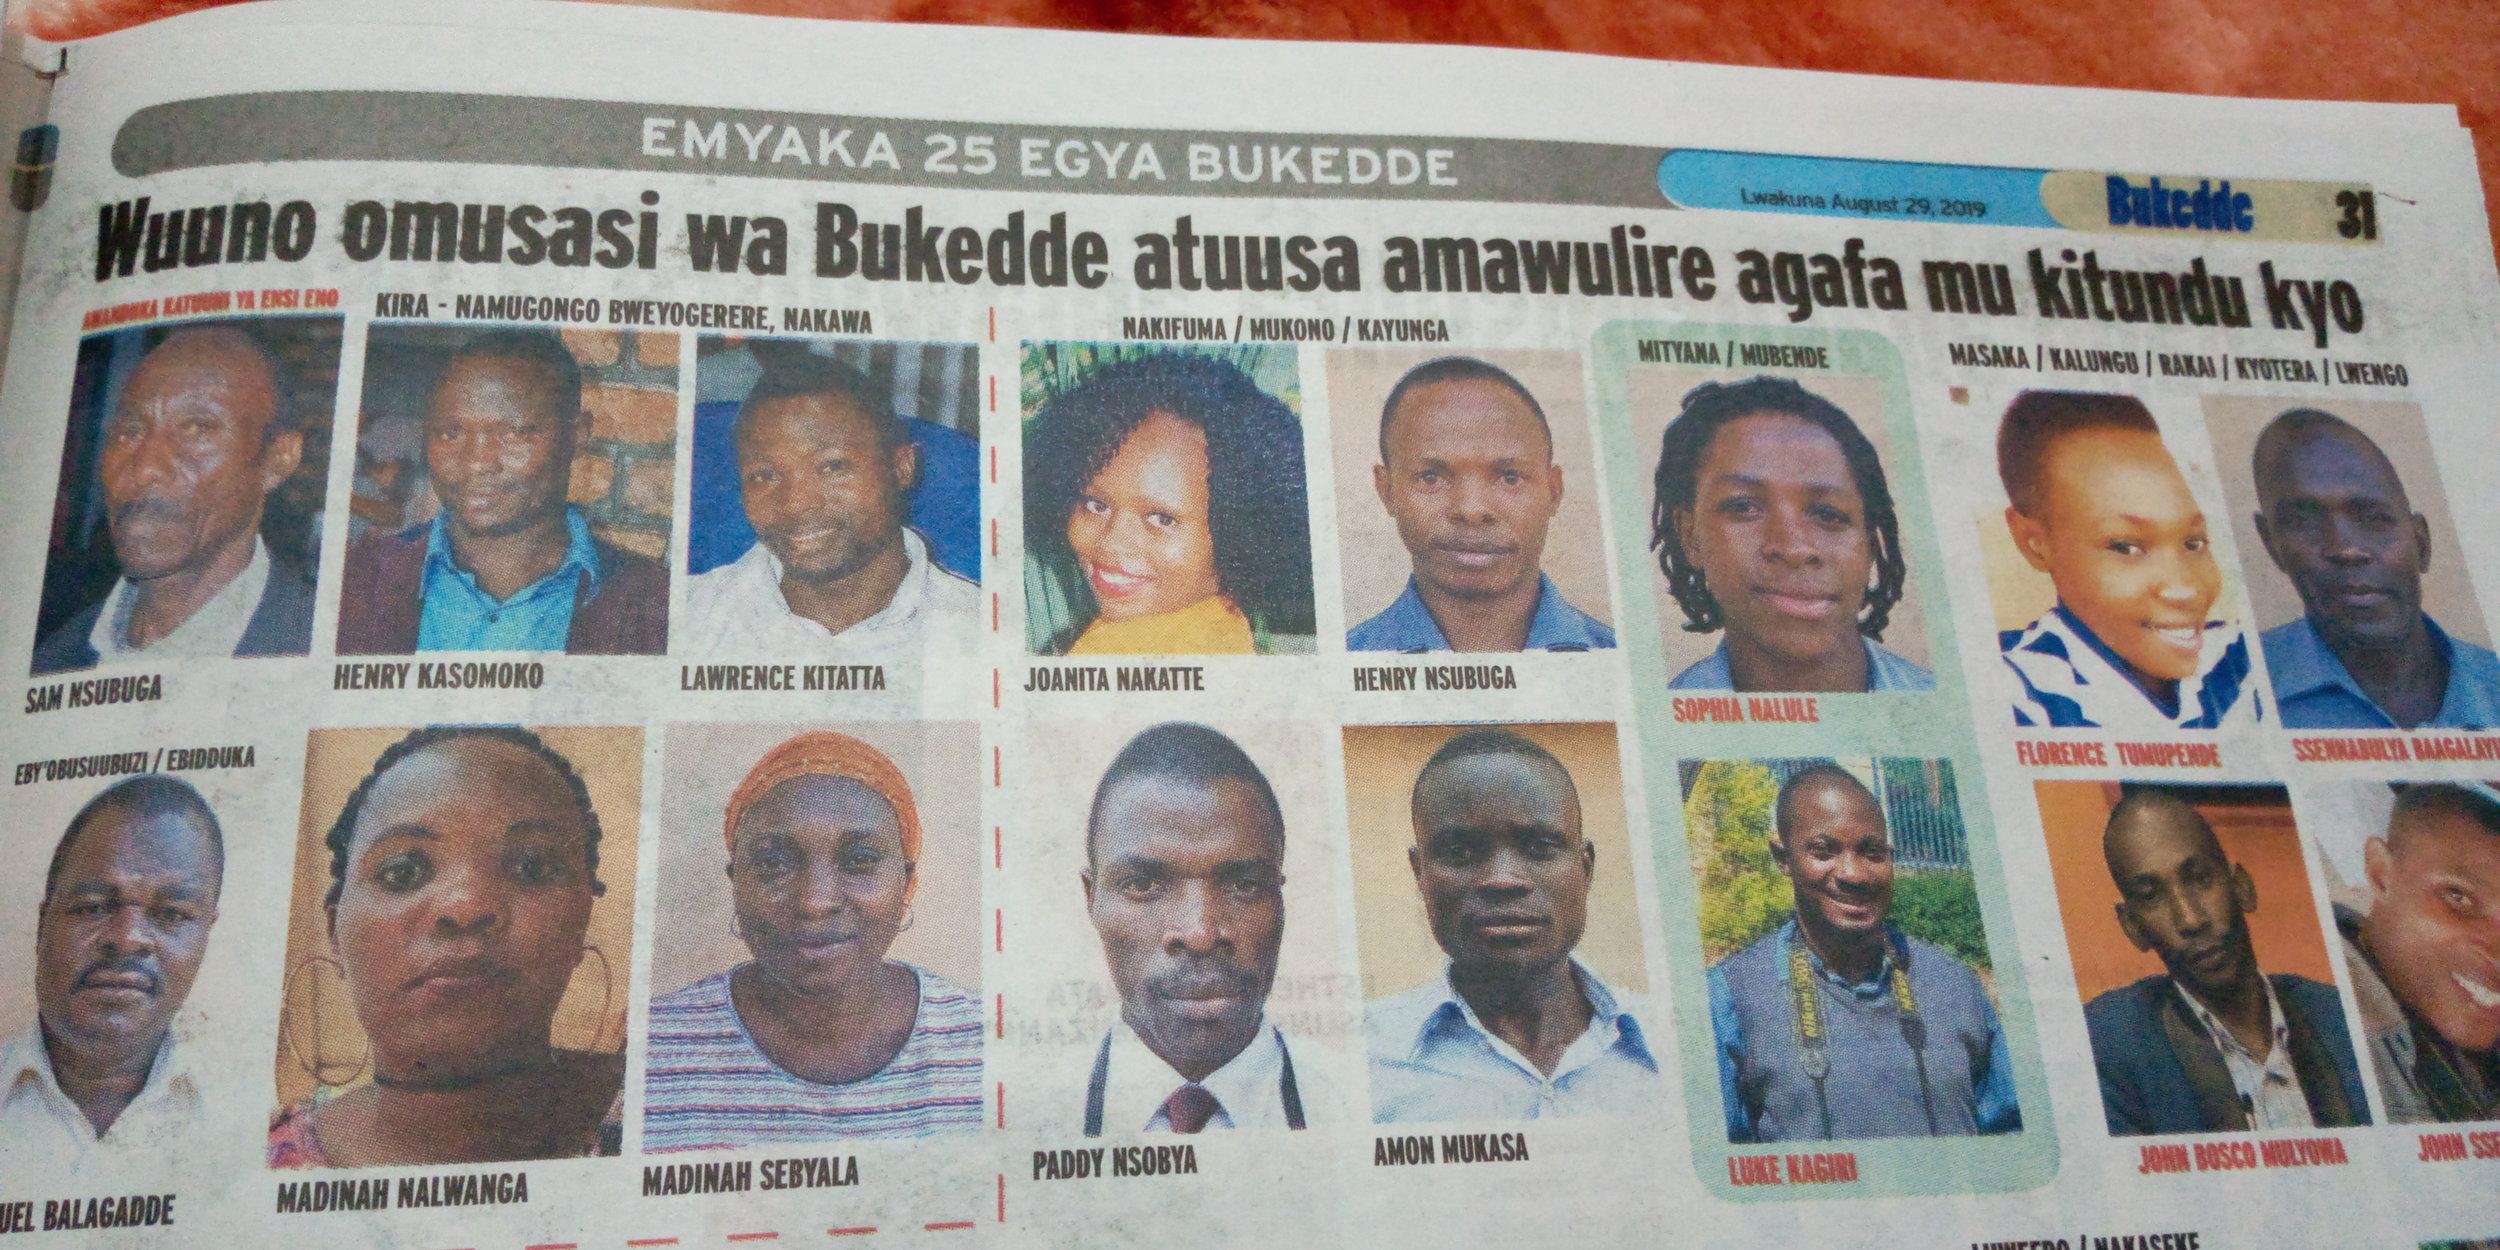 Joanita Nakatte named one of the top 25 rising stars in her newspaper, Uganda